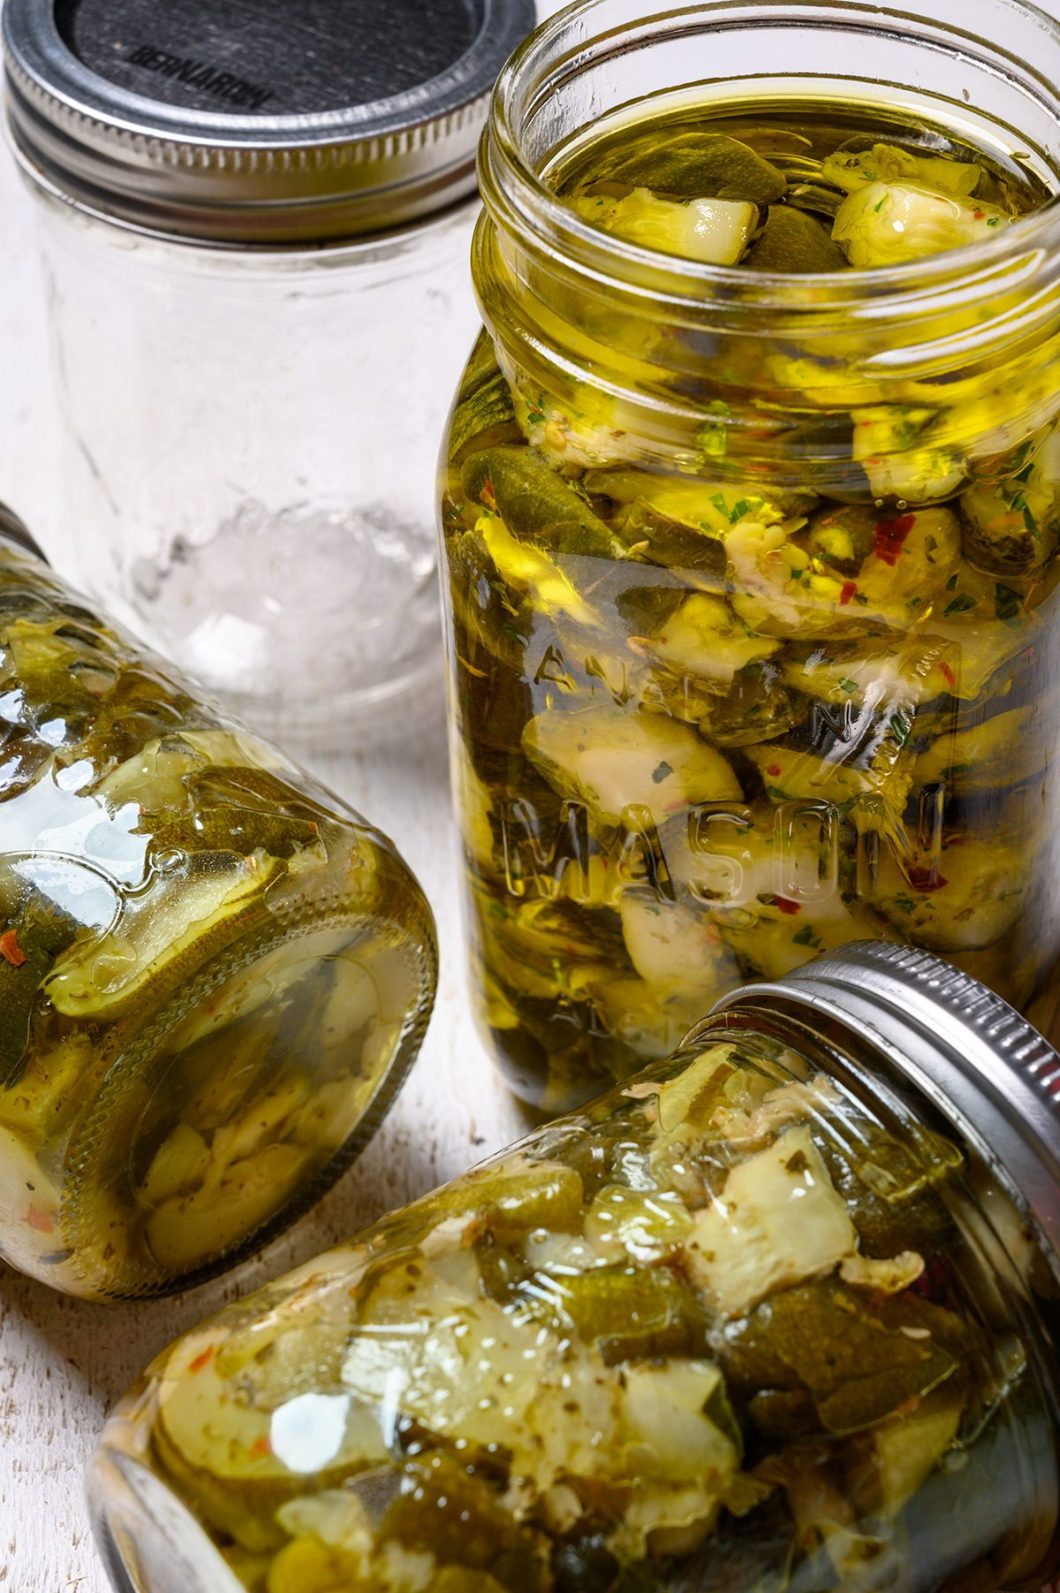 jars of pickled zucchini